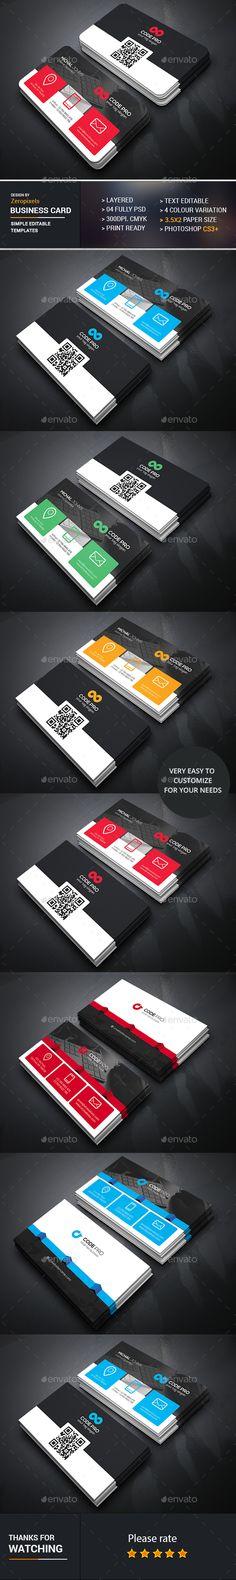 Business Card Bundle Templates PSD. Download here: http://graphicriver.net/item/business-card-bundle/16888762?ref=ksioks